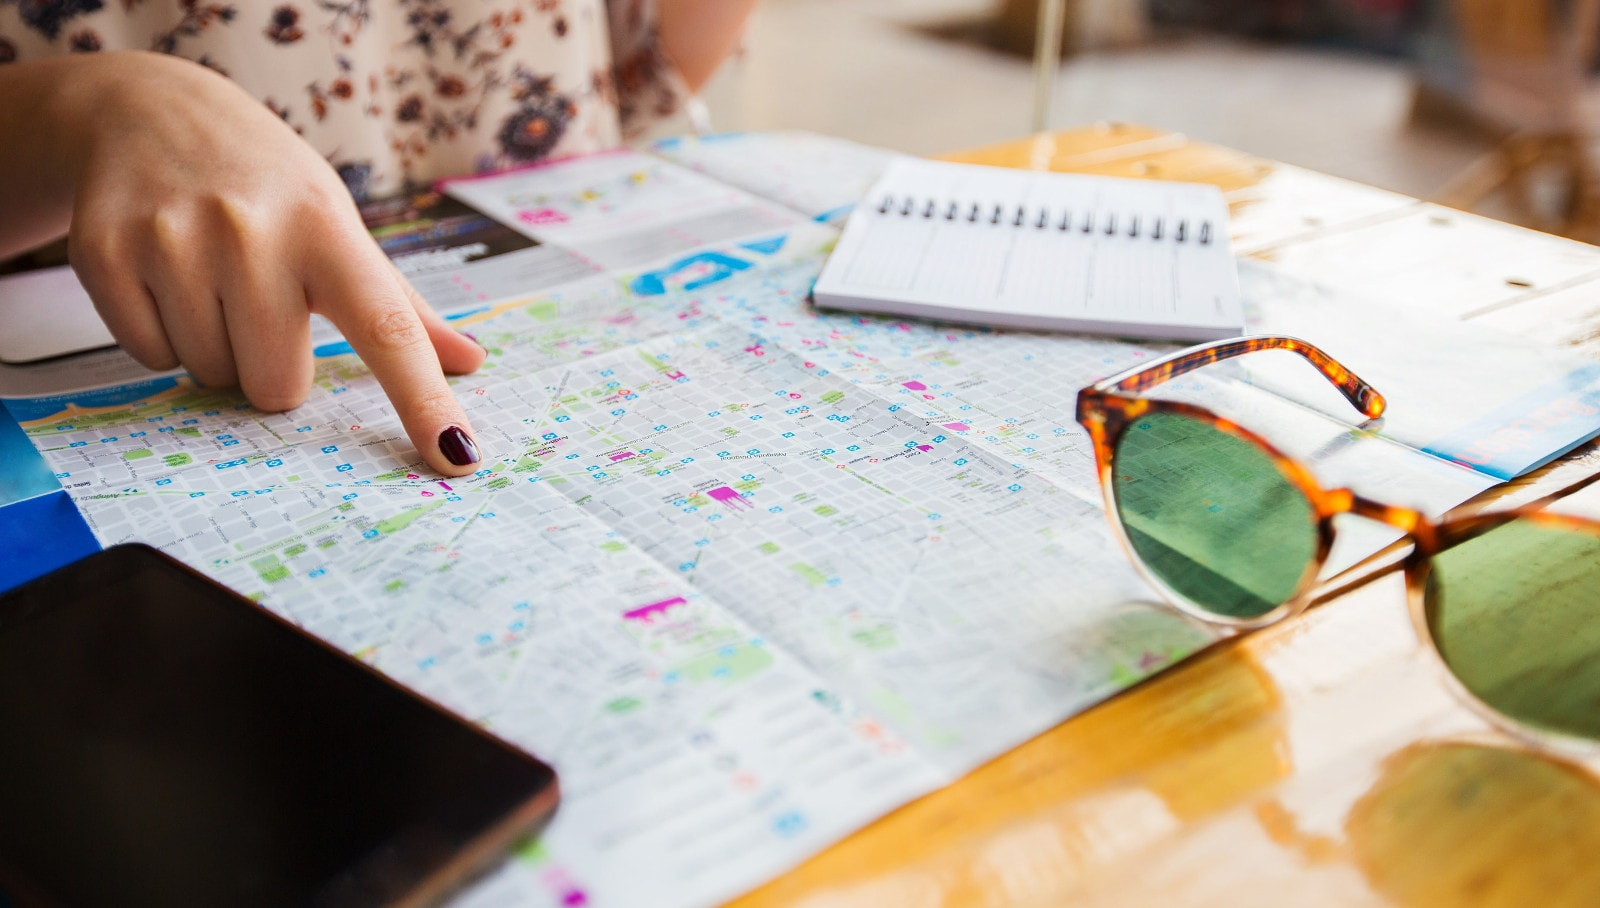 Basic tips to organize your language travel